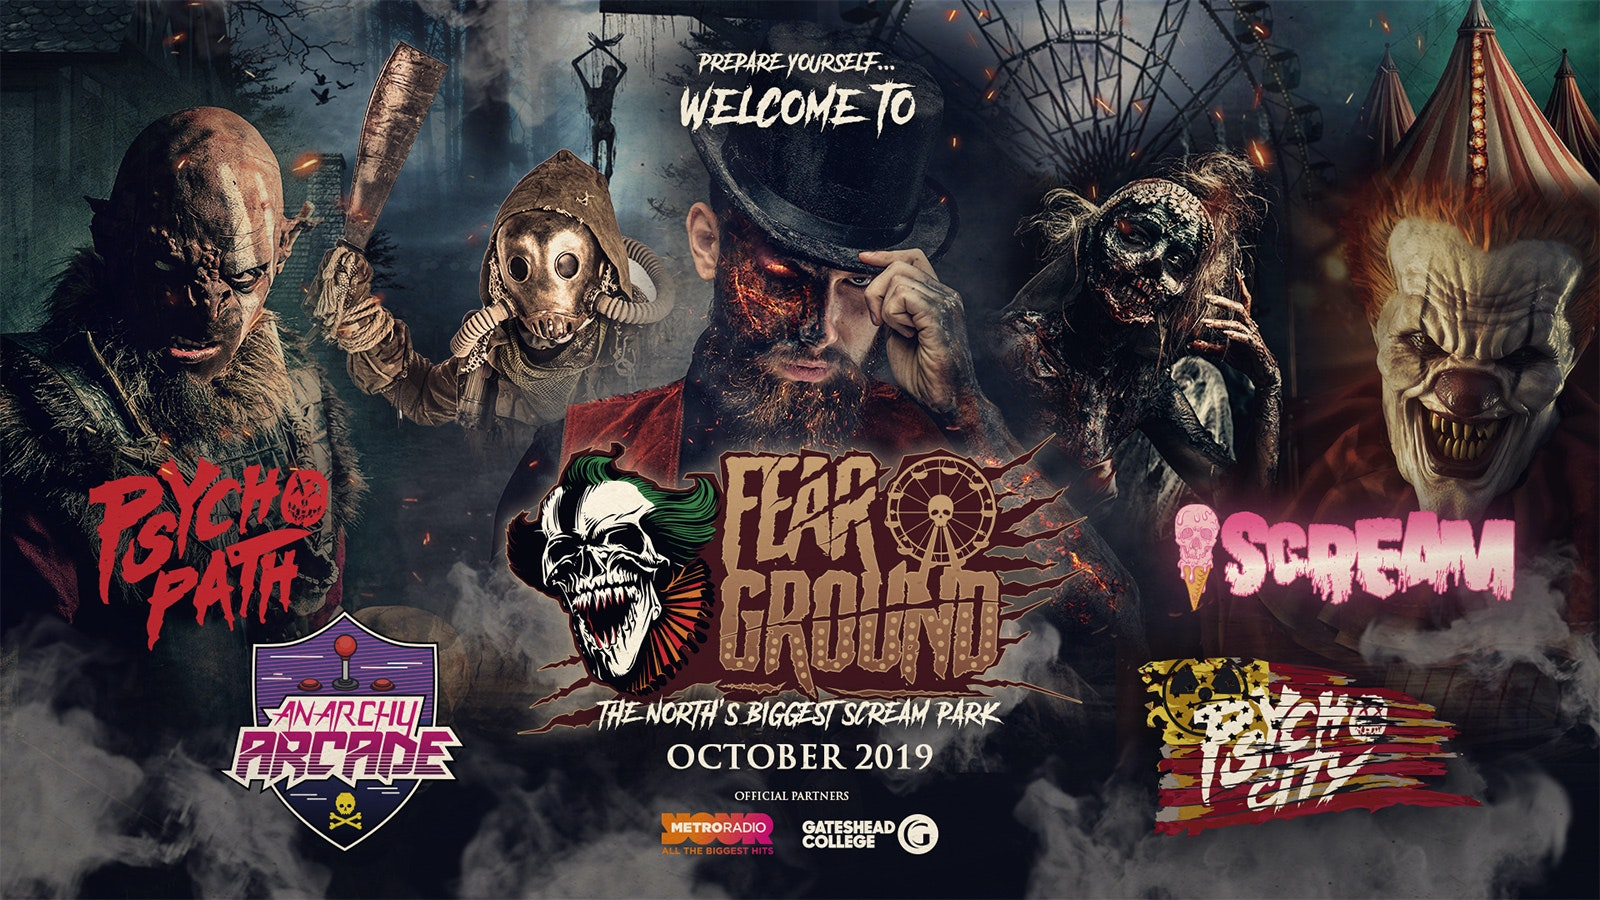 Psycho Path – Friday 18th October 2019